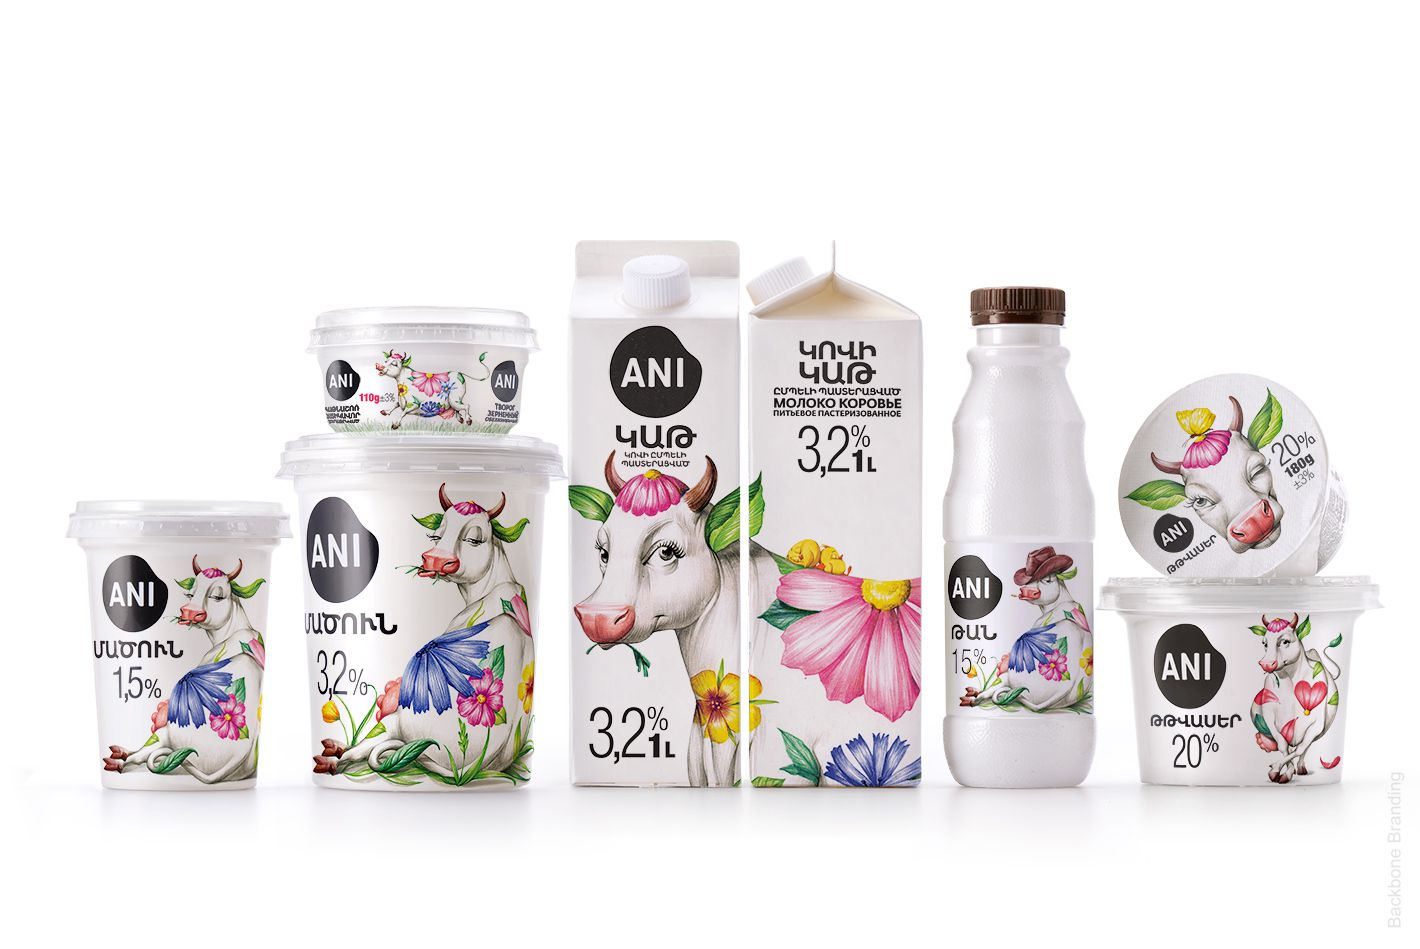 ANI (produits laitiers) I Design : Backbone Branding, Arménie (janvier 2020)